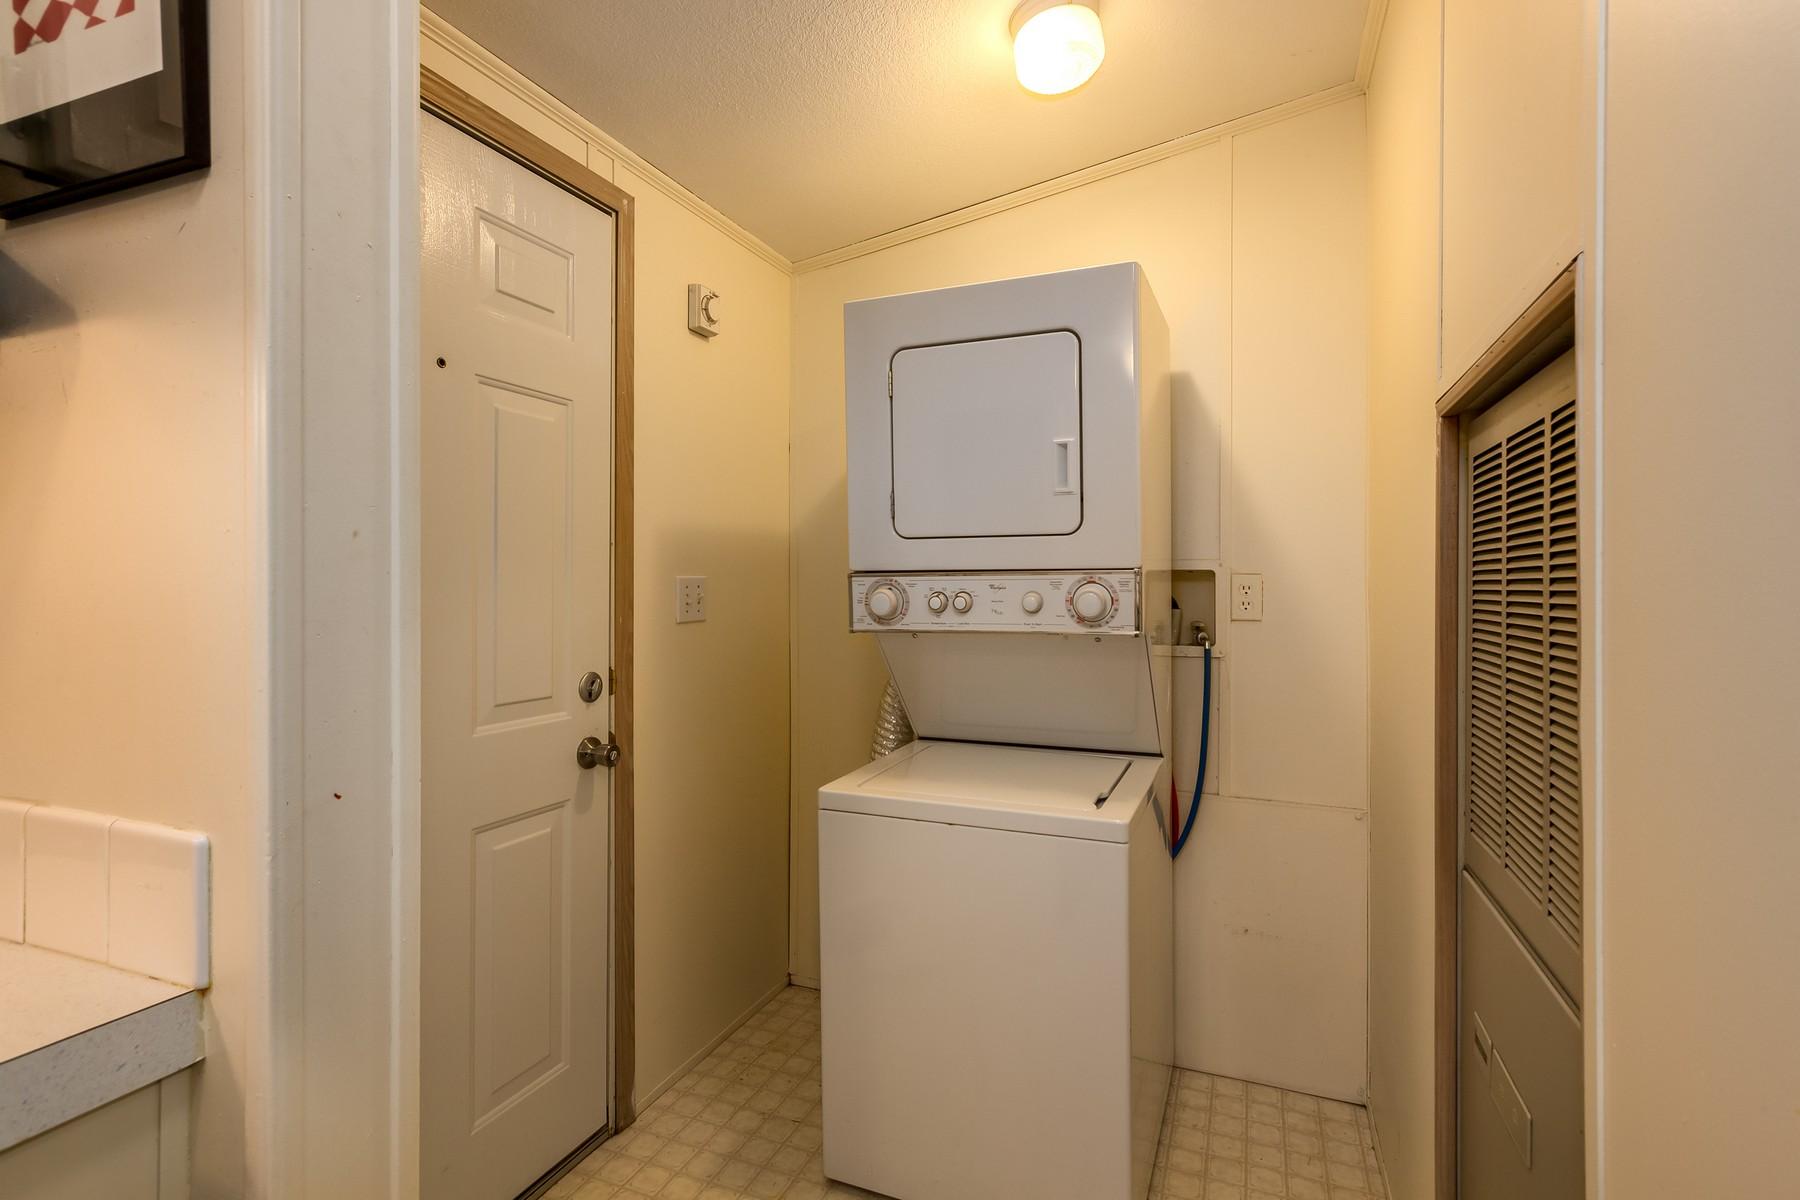 Additional photo for property listing at Affordable Gem in Fletcher Bay 8480 NE Hansen Rd 班布里奇岛, 华盛顿州 98110 美国